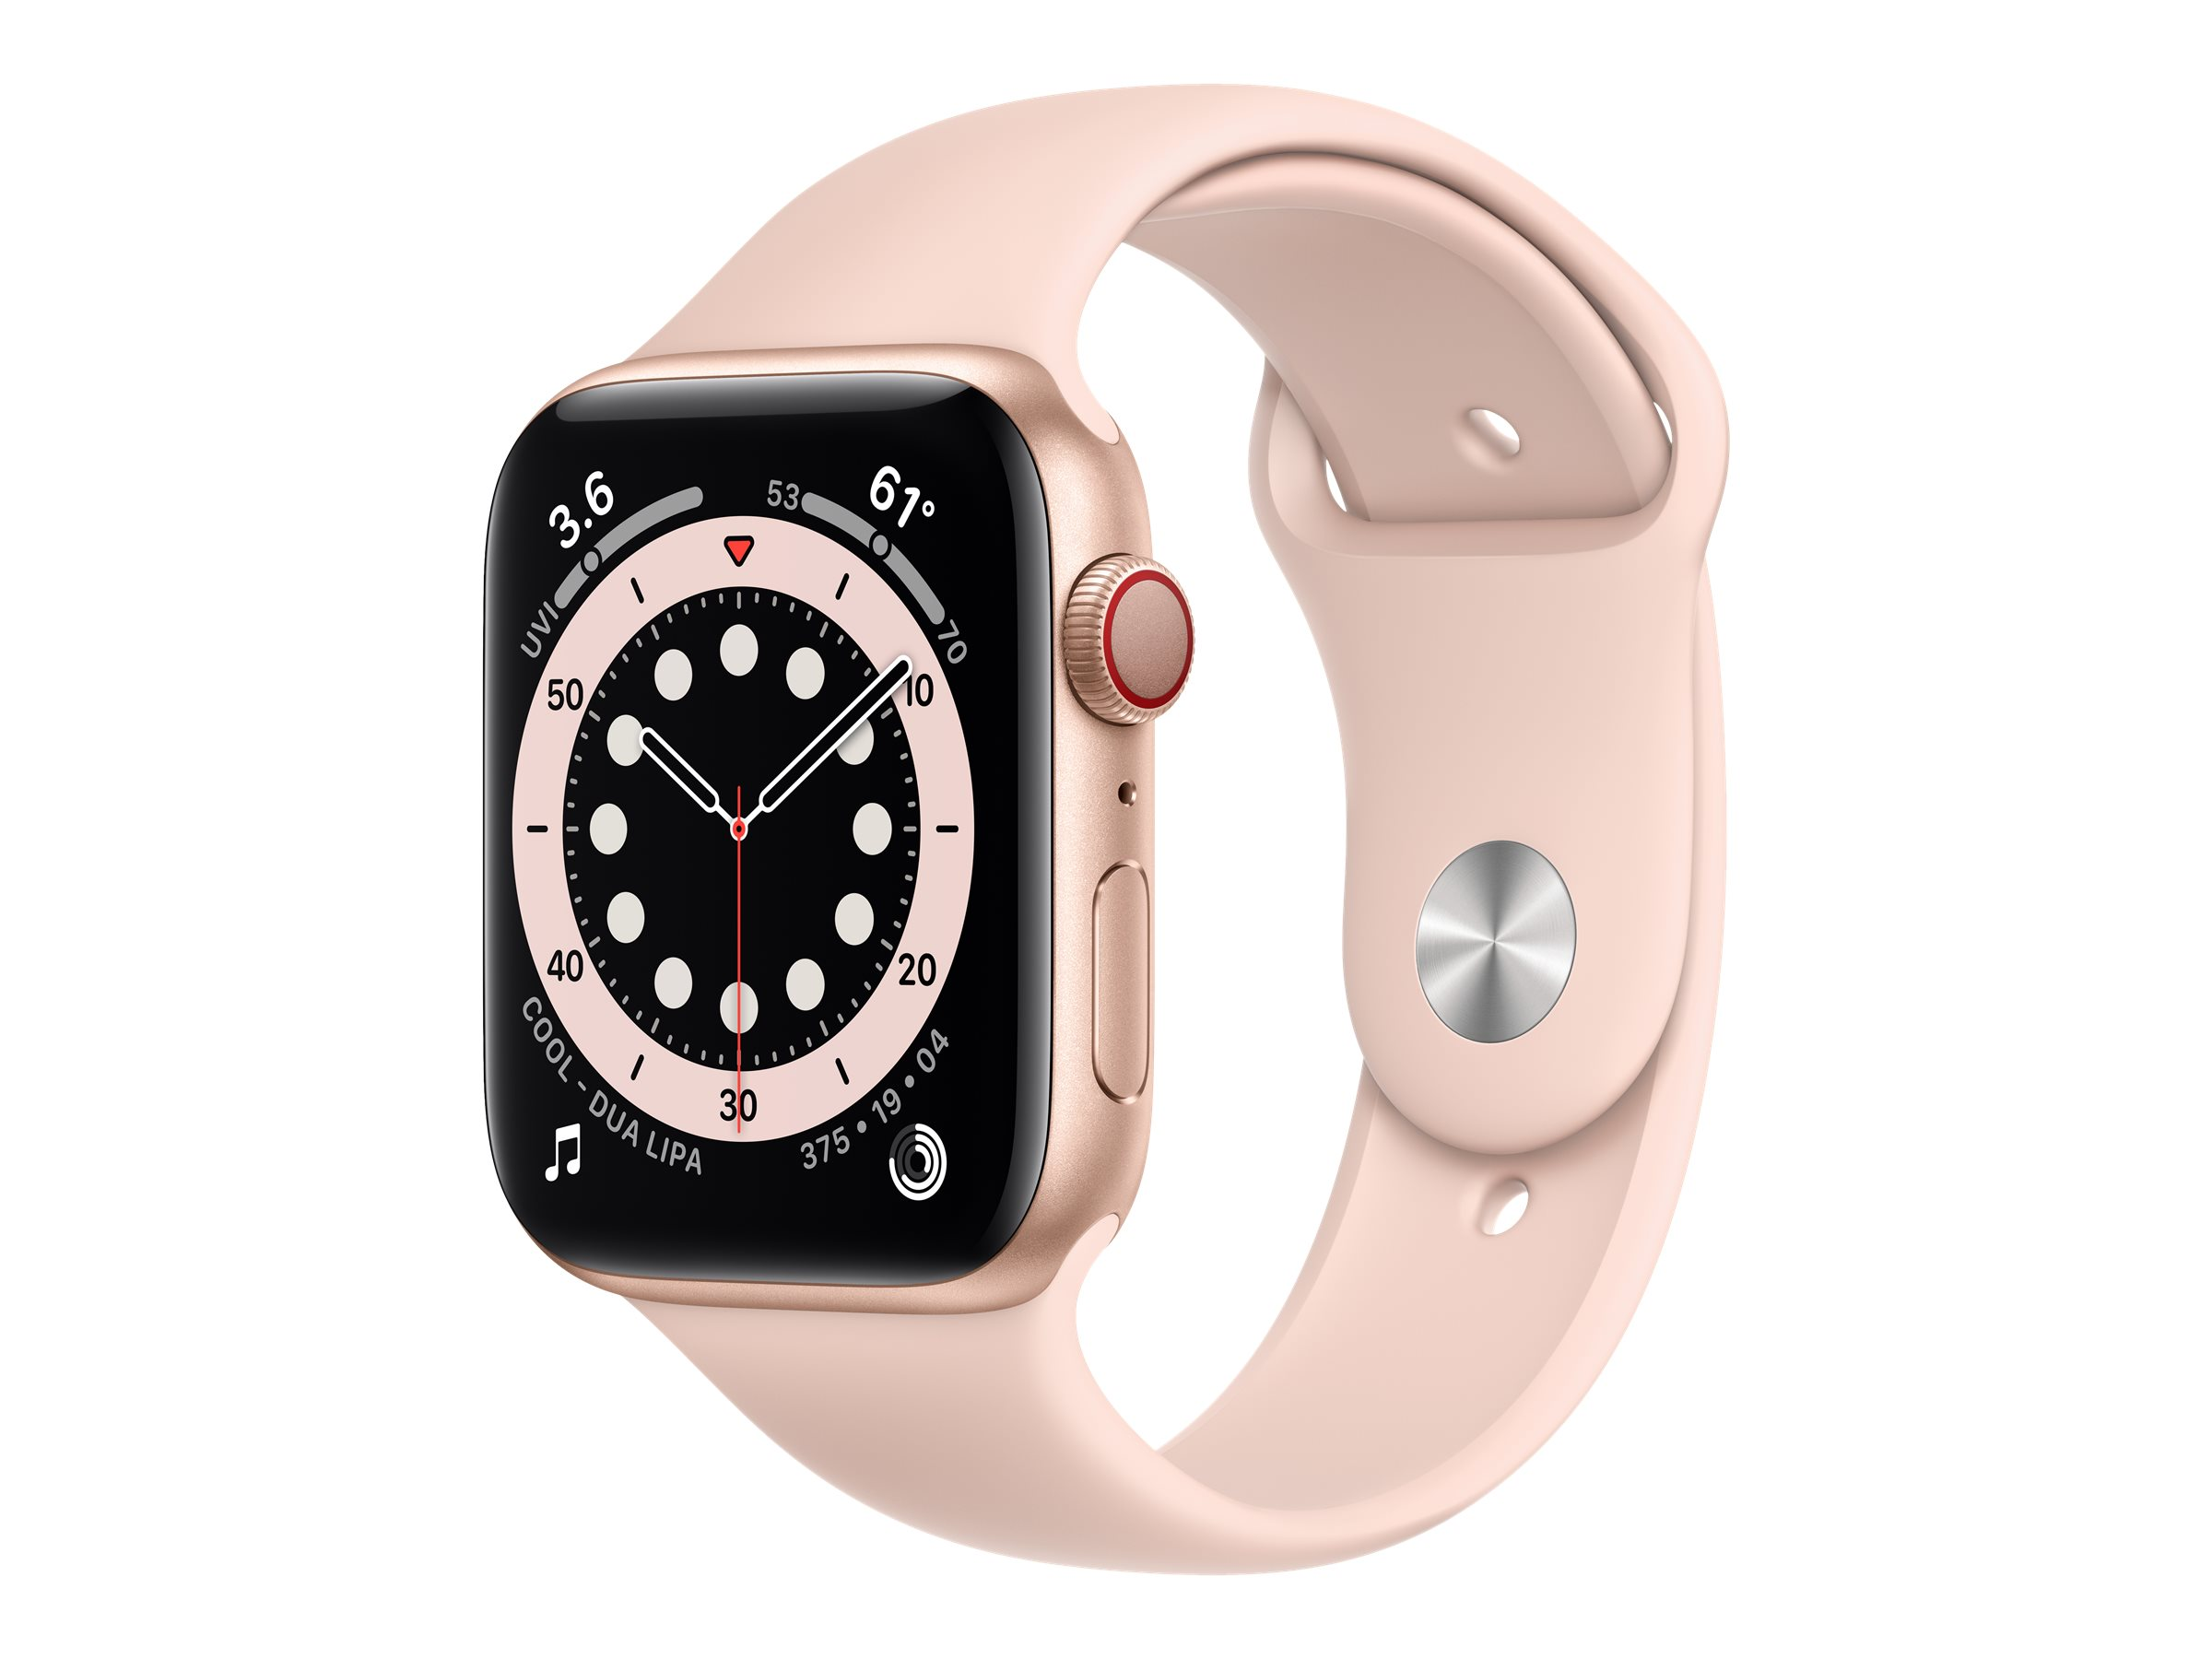 Apple Watch Series 6 (GPS + Cellular) - 44 mm